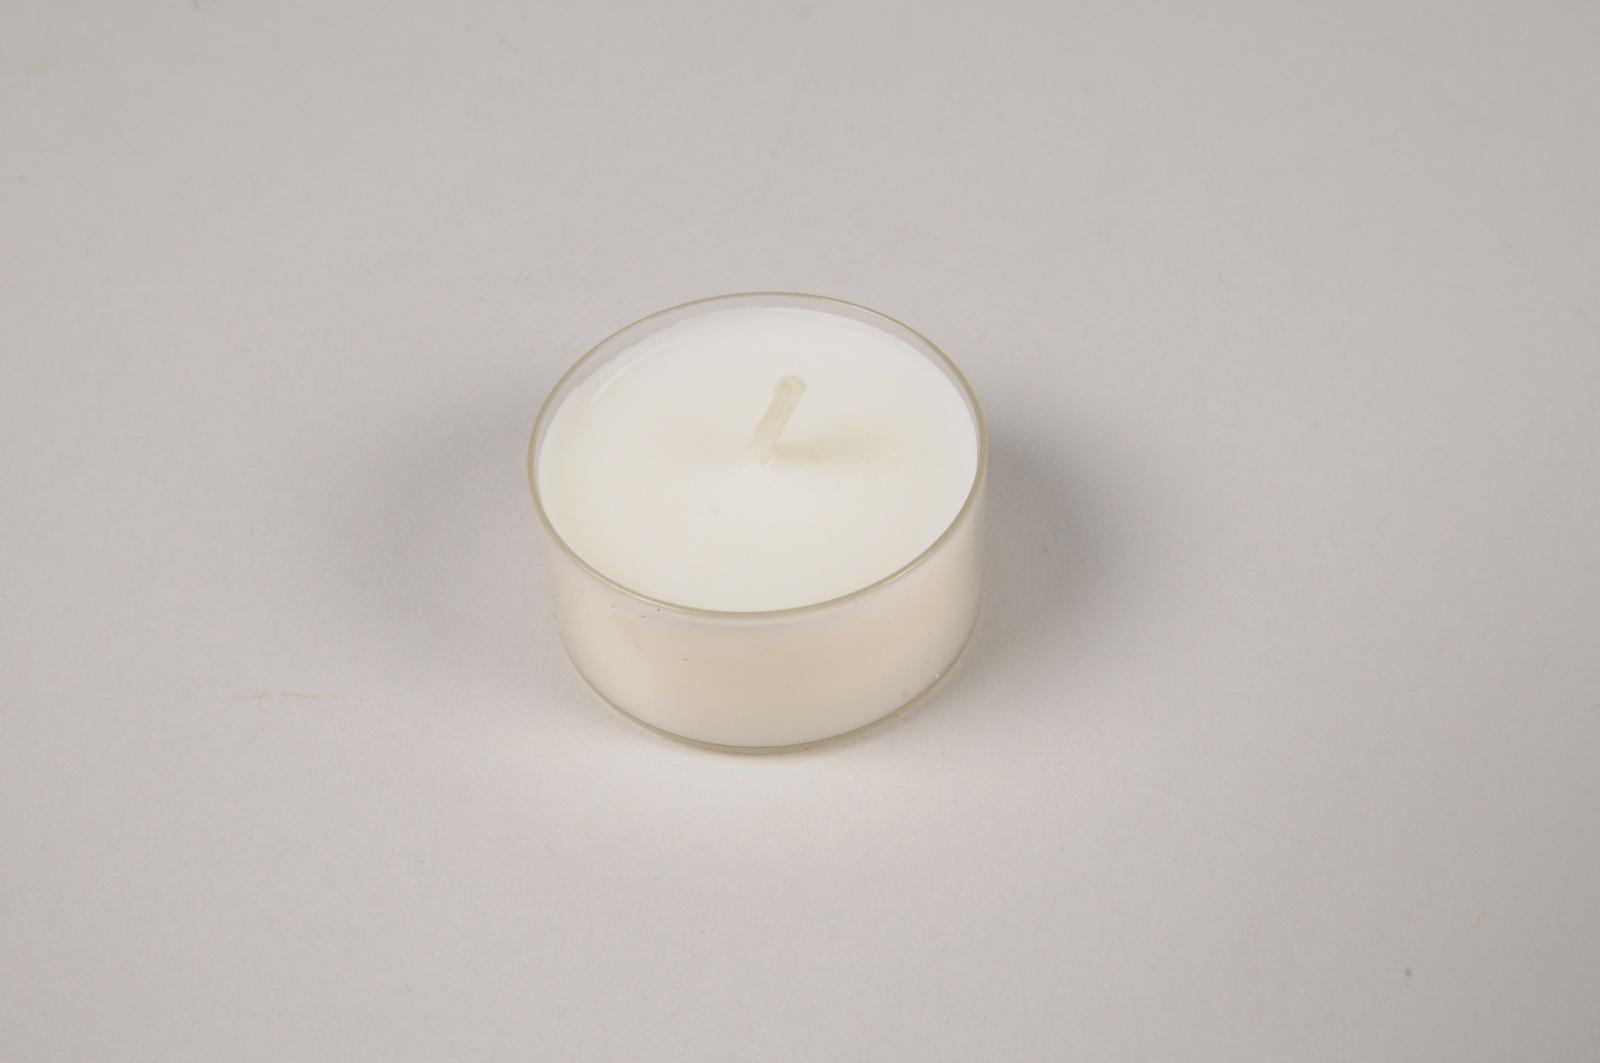 A024RP Paquet de 27 bougies chauffe-plat naturelles D3.5cm